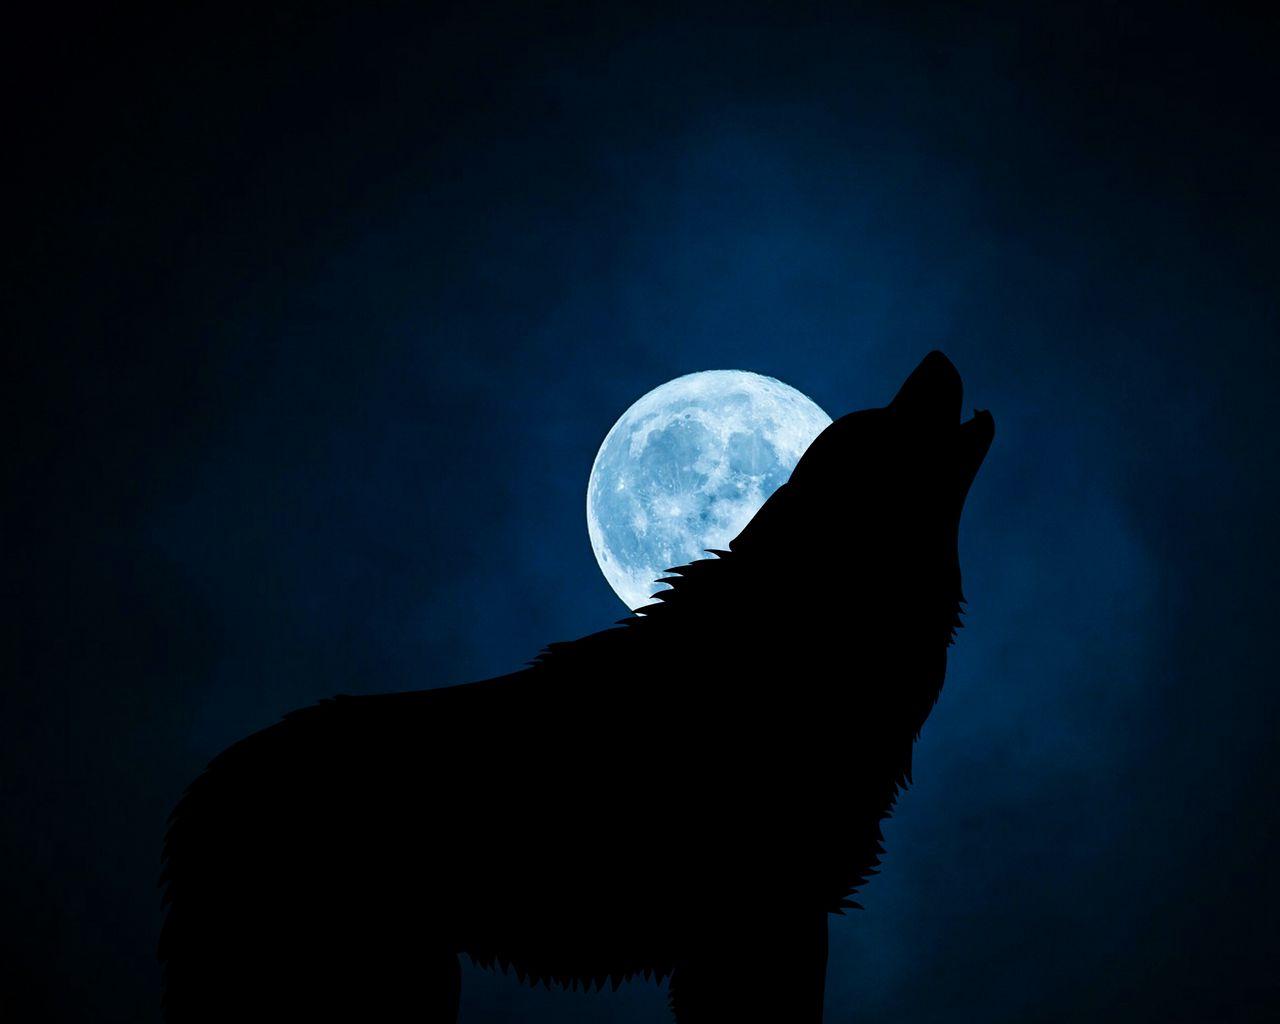 1280x1024 Wallpaper wolf, silhouette, moon, night